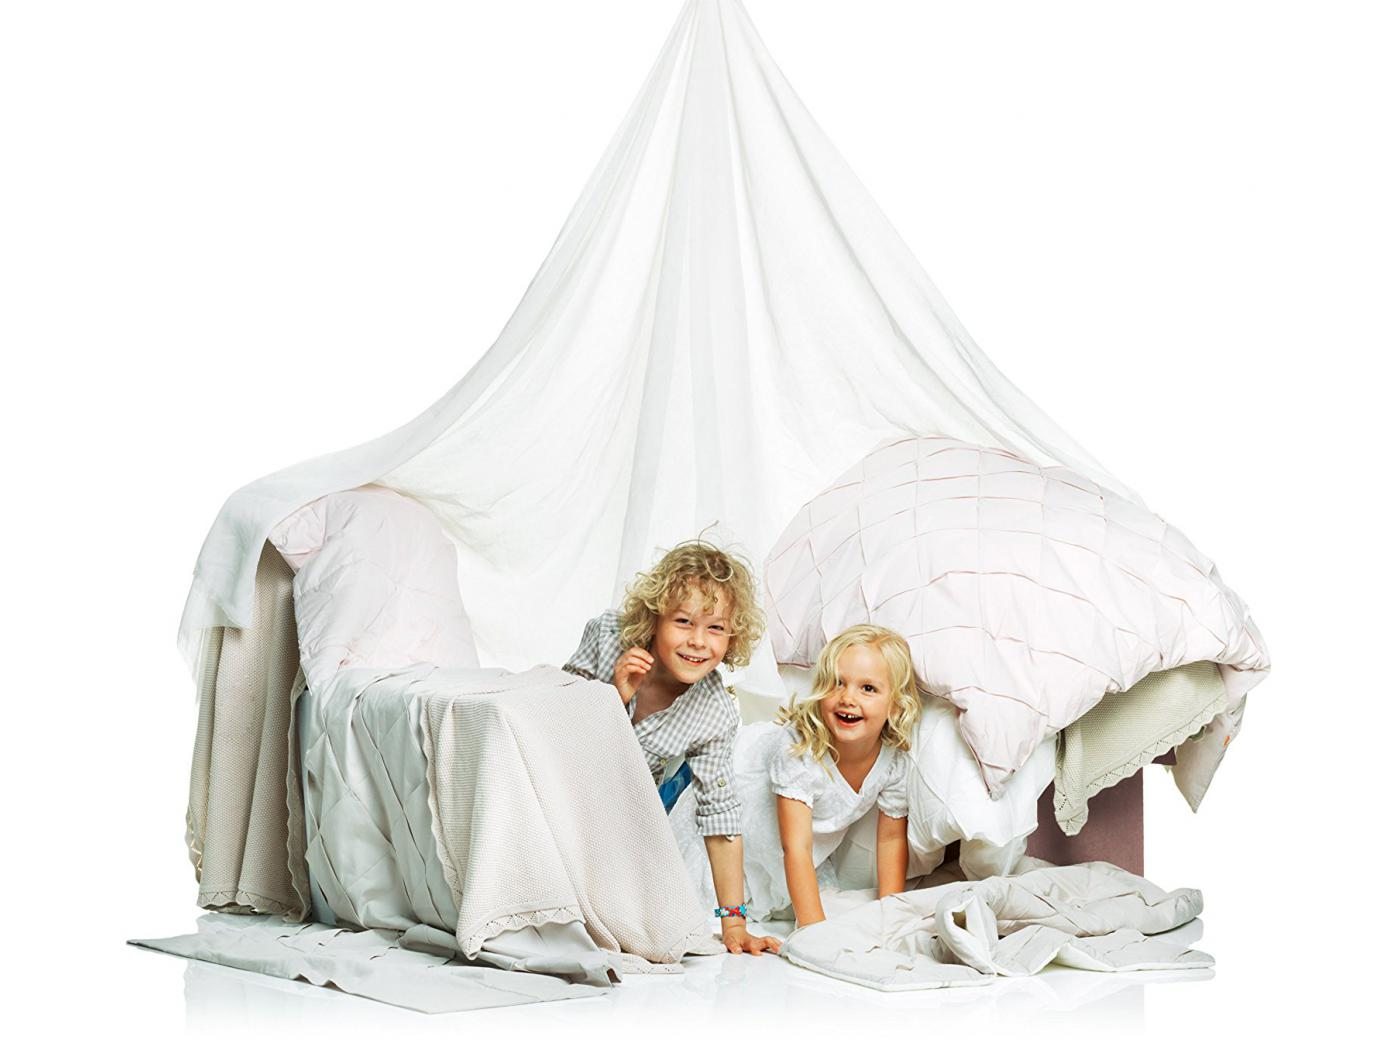 stokke sleepi housse de couette 100x140 cm taie 40x60. Black Bedroom Furniture Sets. Home Design Ideas